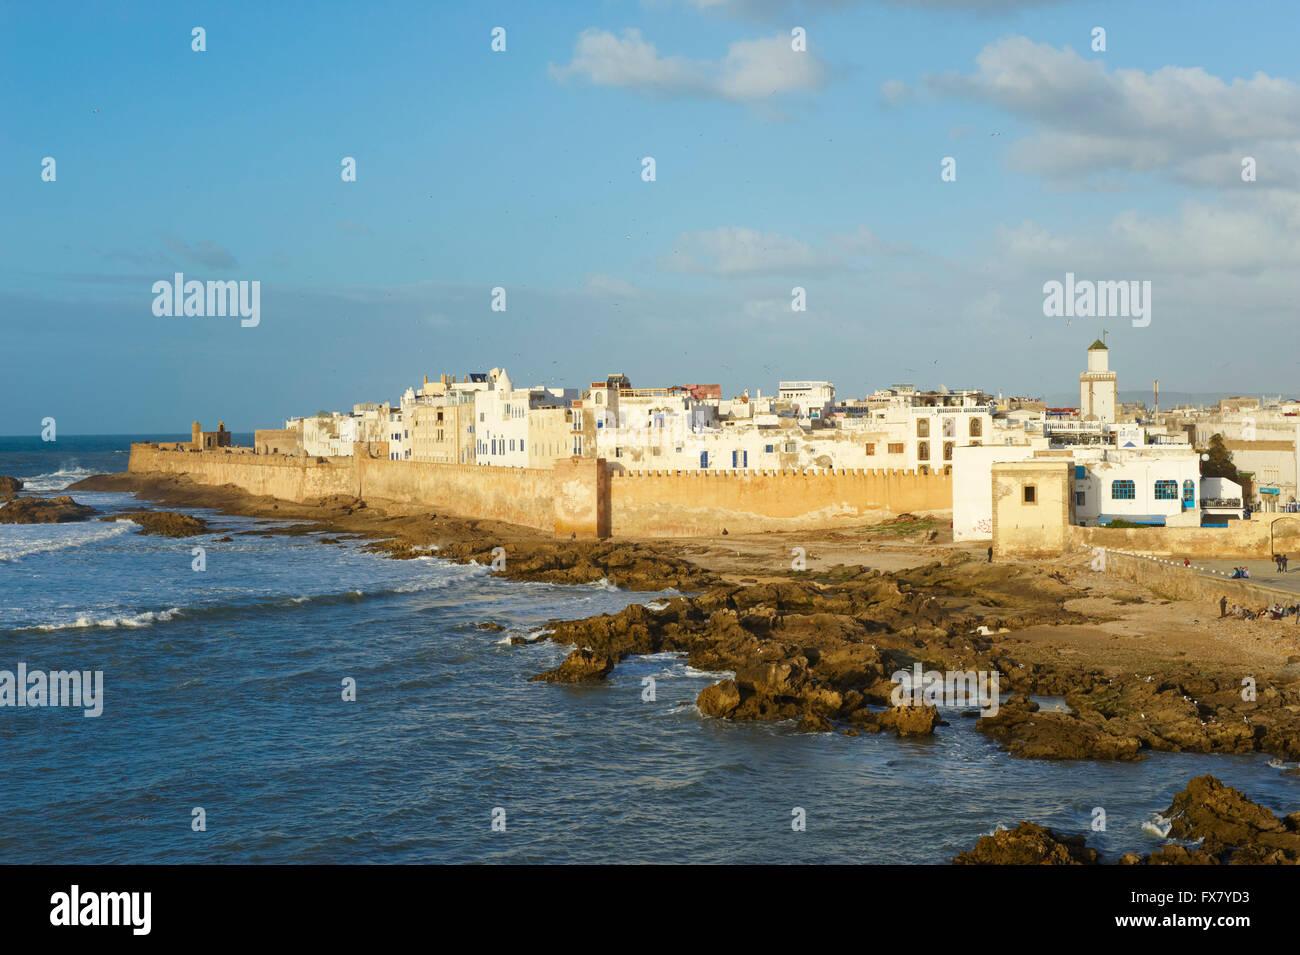 Morocco, Medina, Essaouira, Atlantic coast - Stock Image